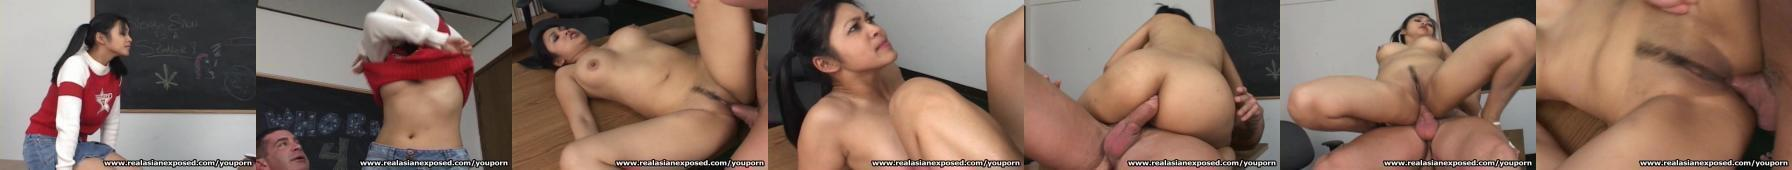 Filmy porno z Mika Tan